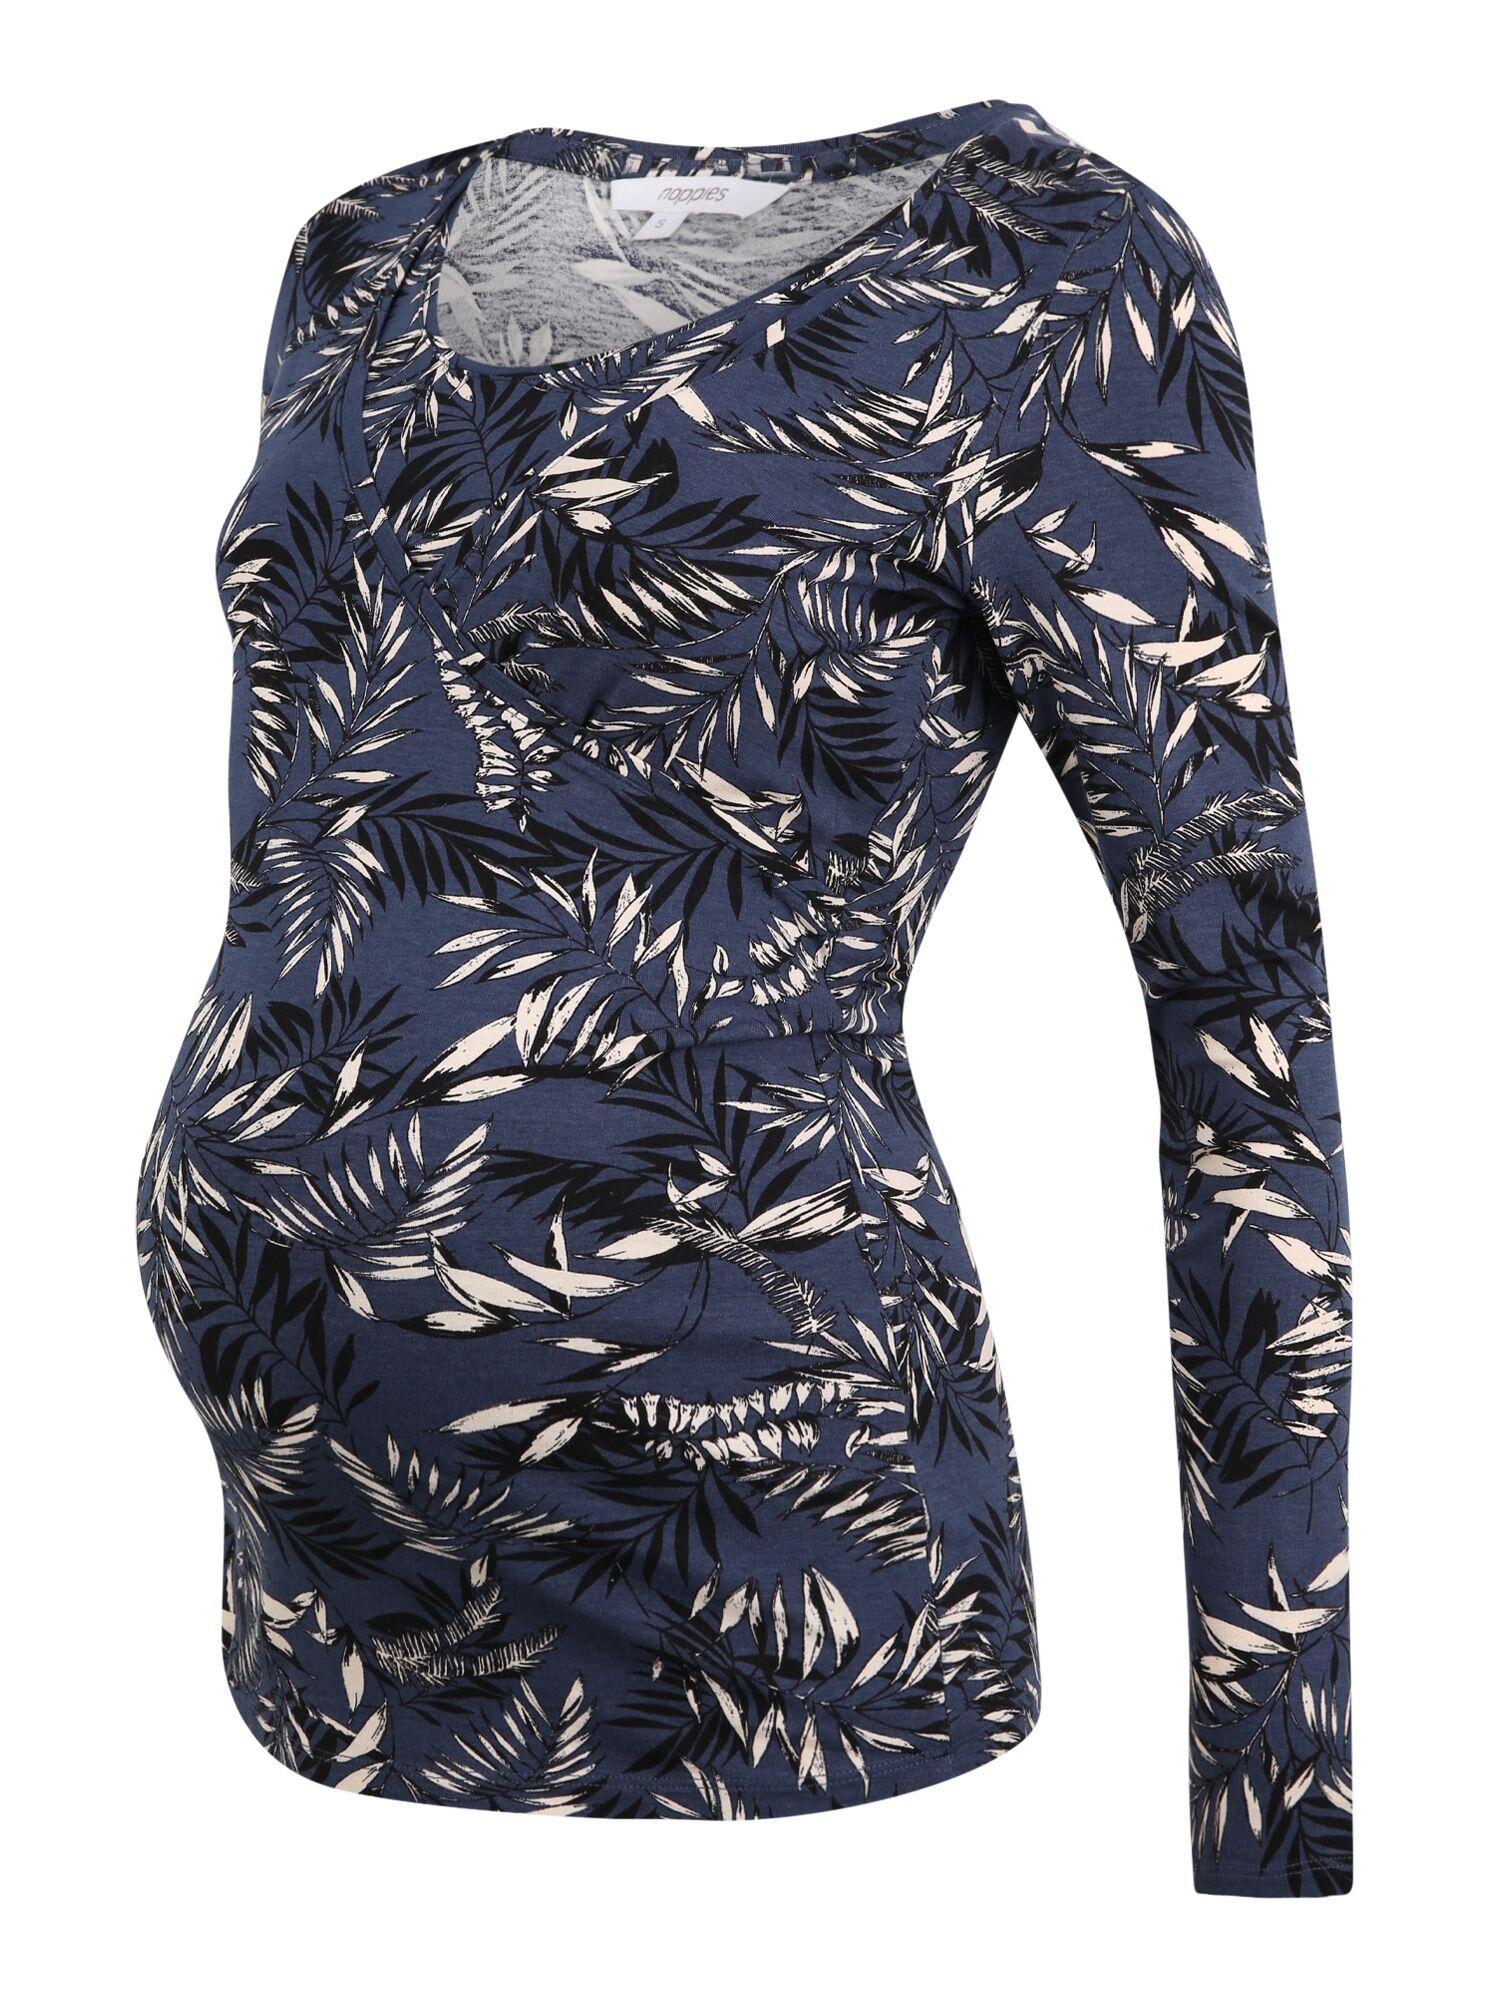 Noppies T-shirt 'Avoca'  - Bleu - Taille: XXL - female